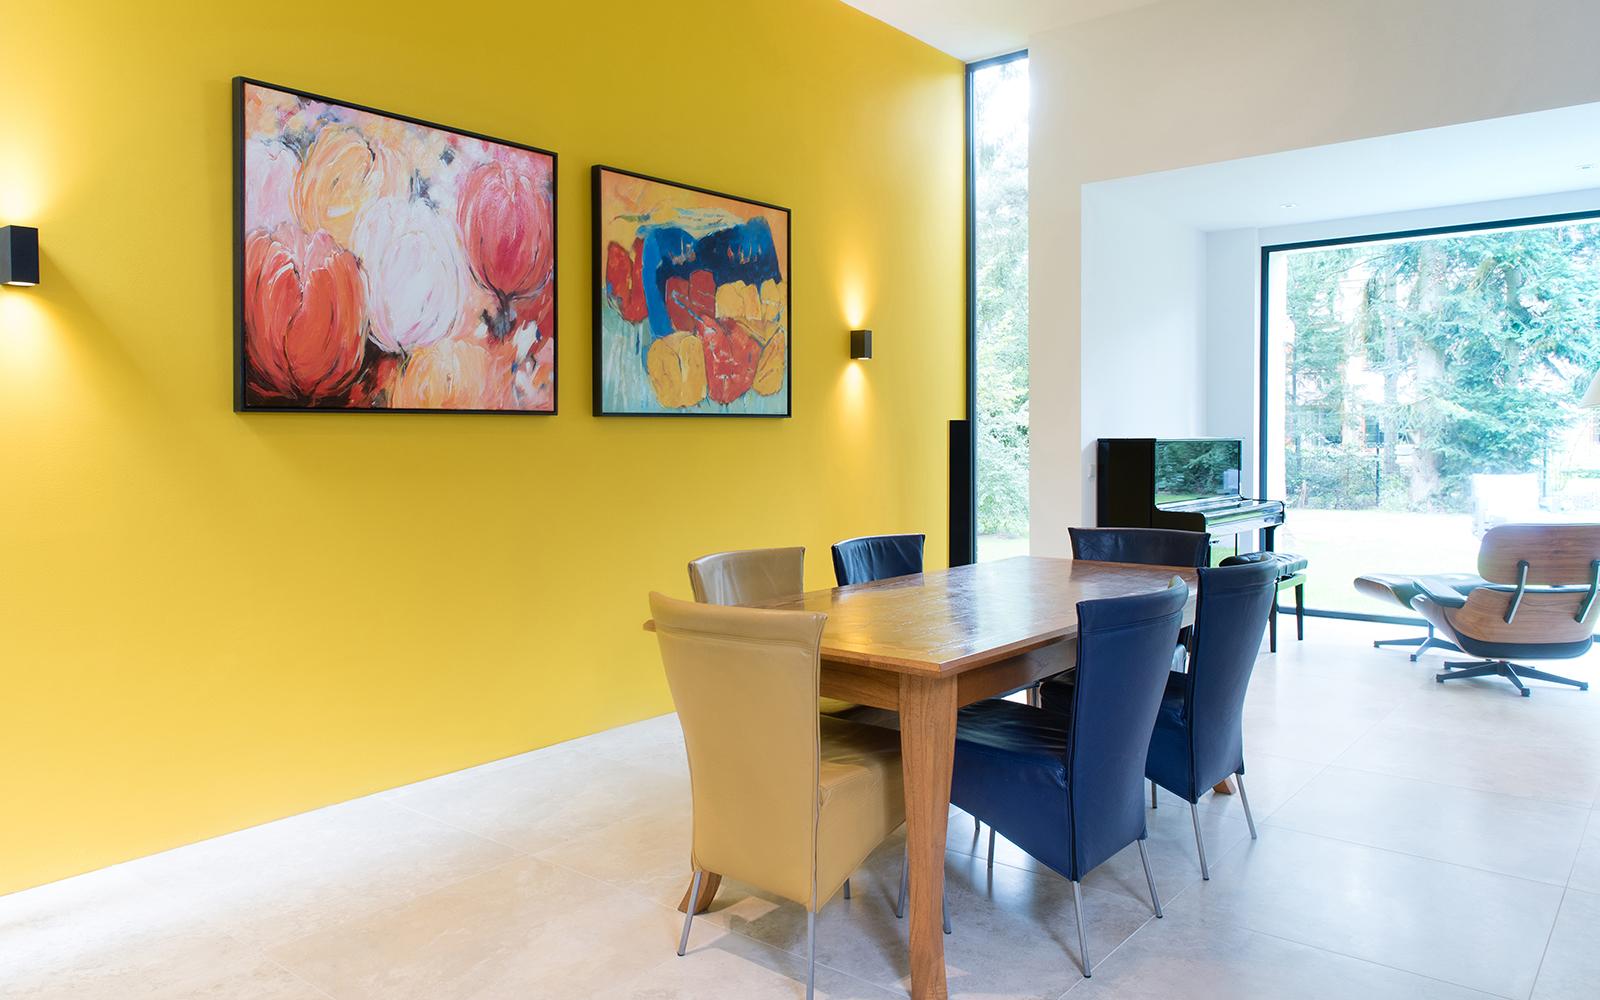 Moderne bosvilla, A&R10, levensloopbestendige woning, gelijksvloer, overdekt terras